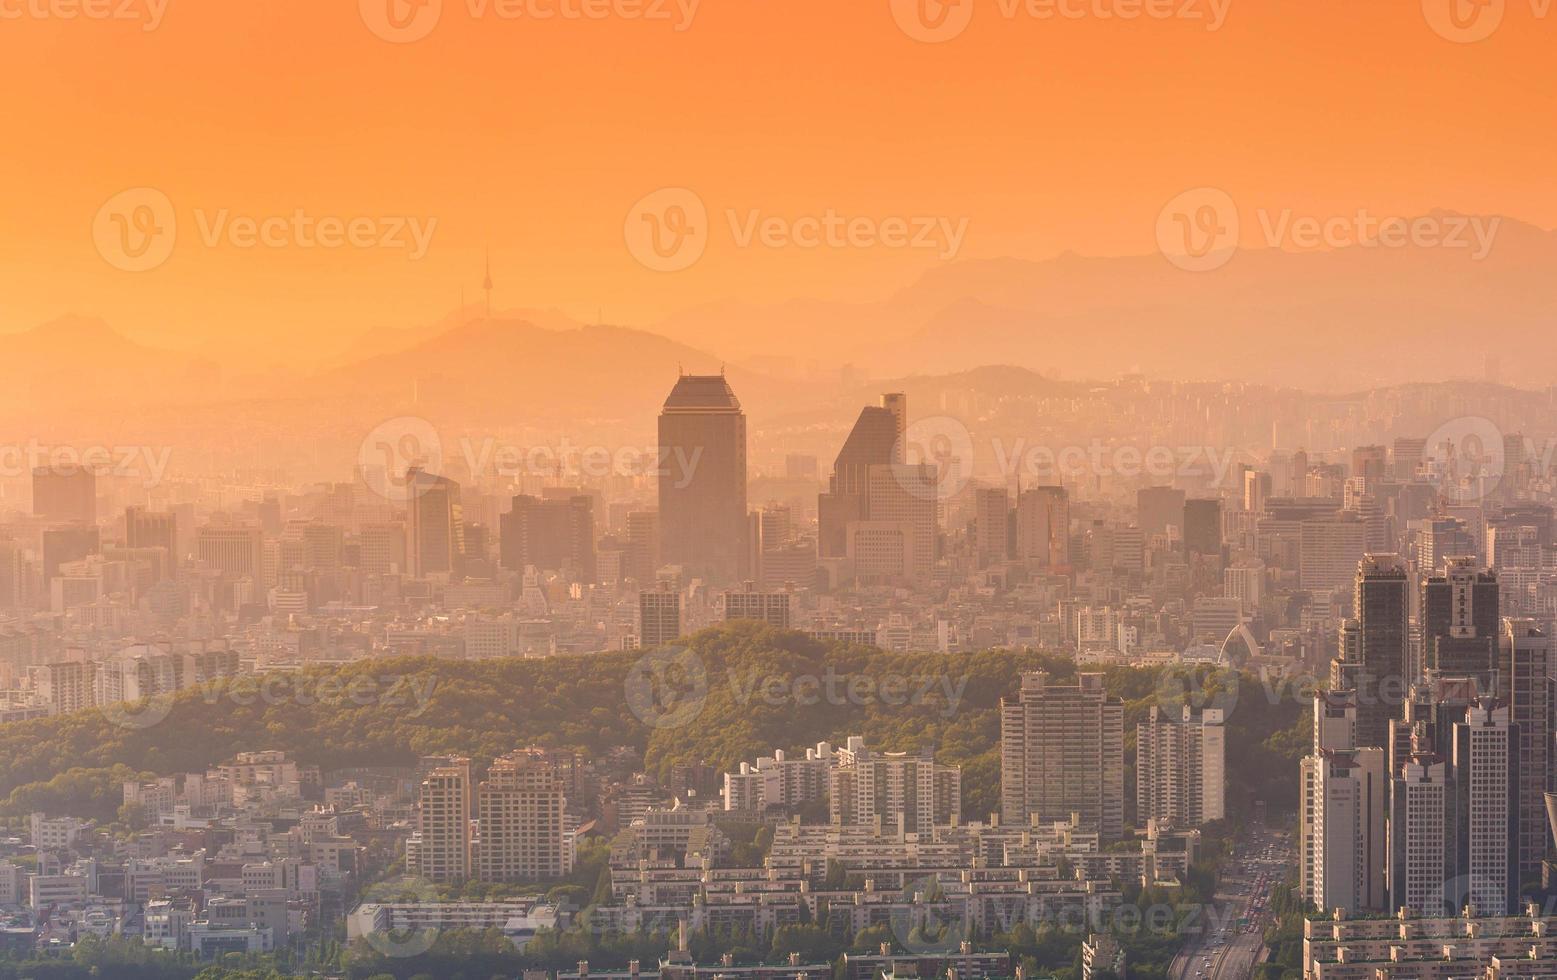 seoul stad en het centrum skyline in zonsondergang in mistige dag. foto